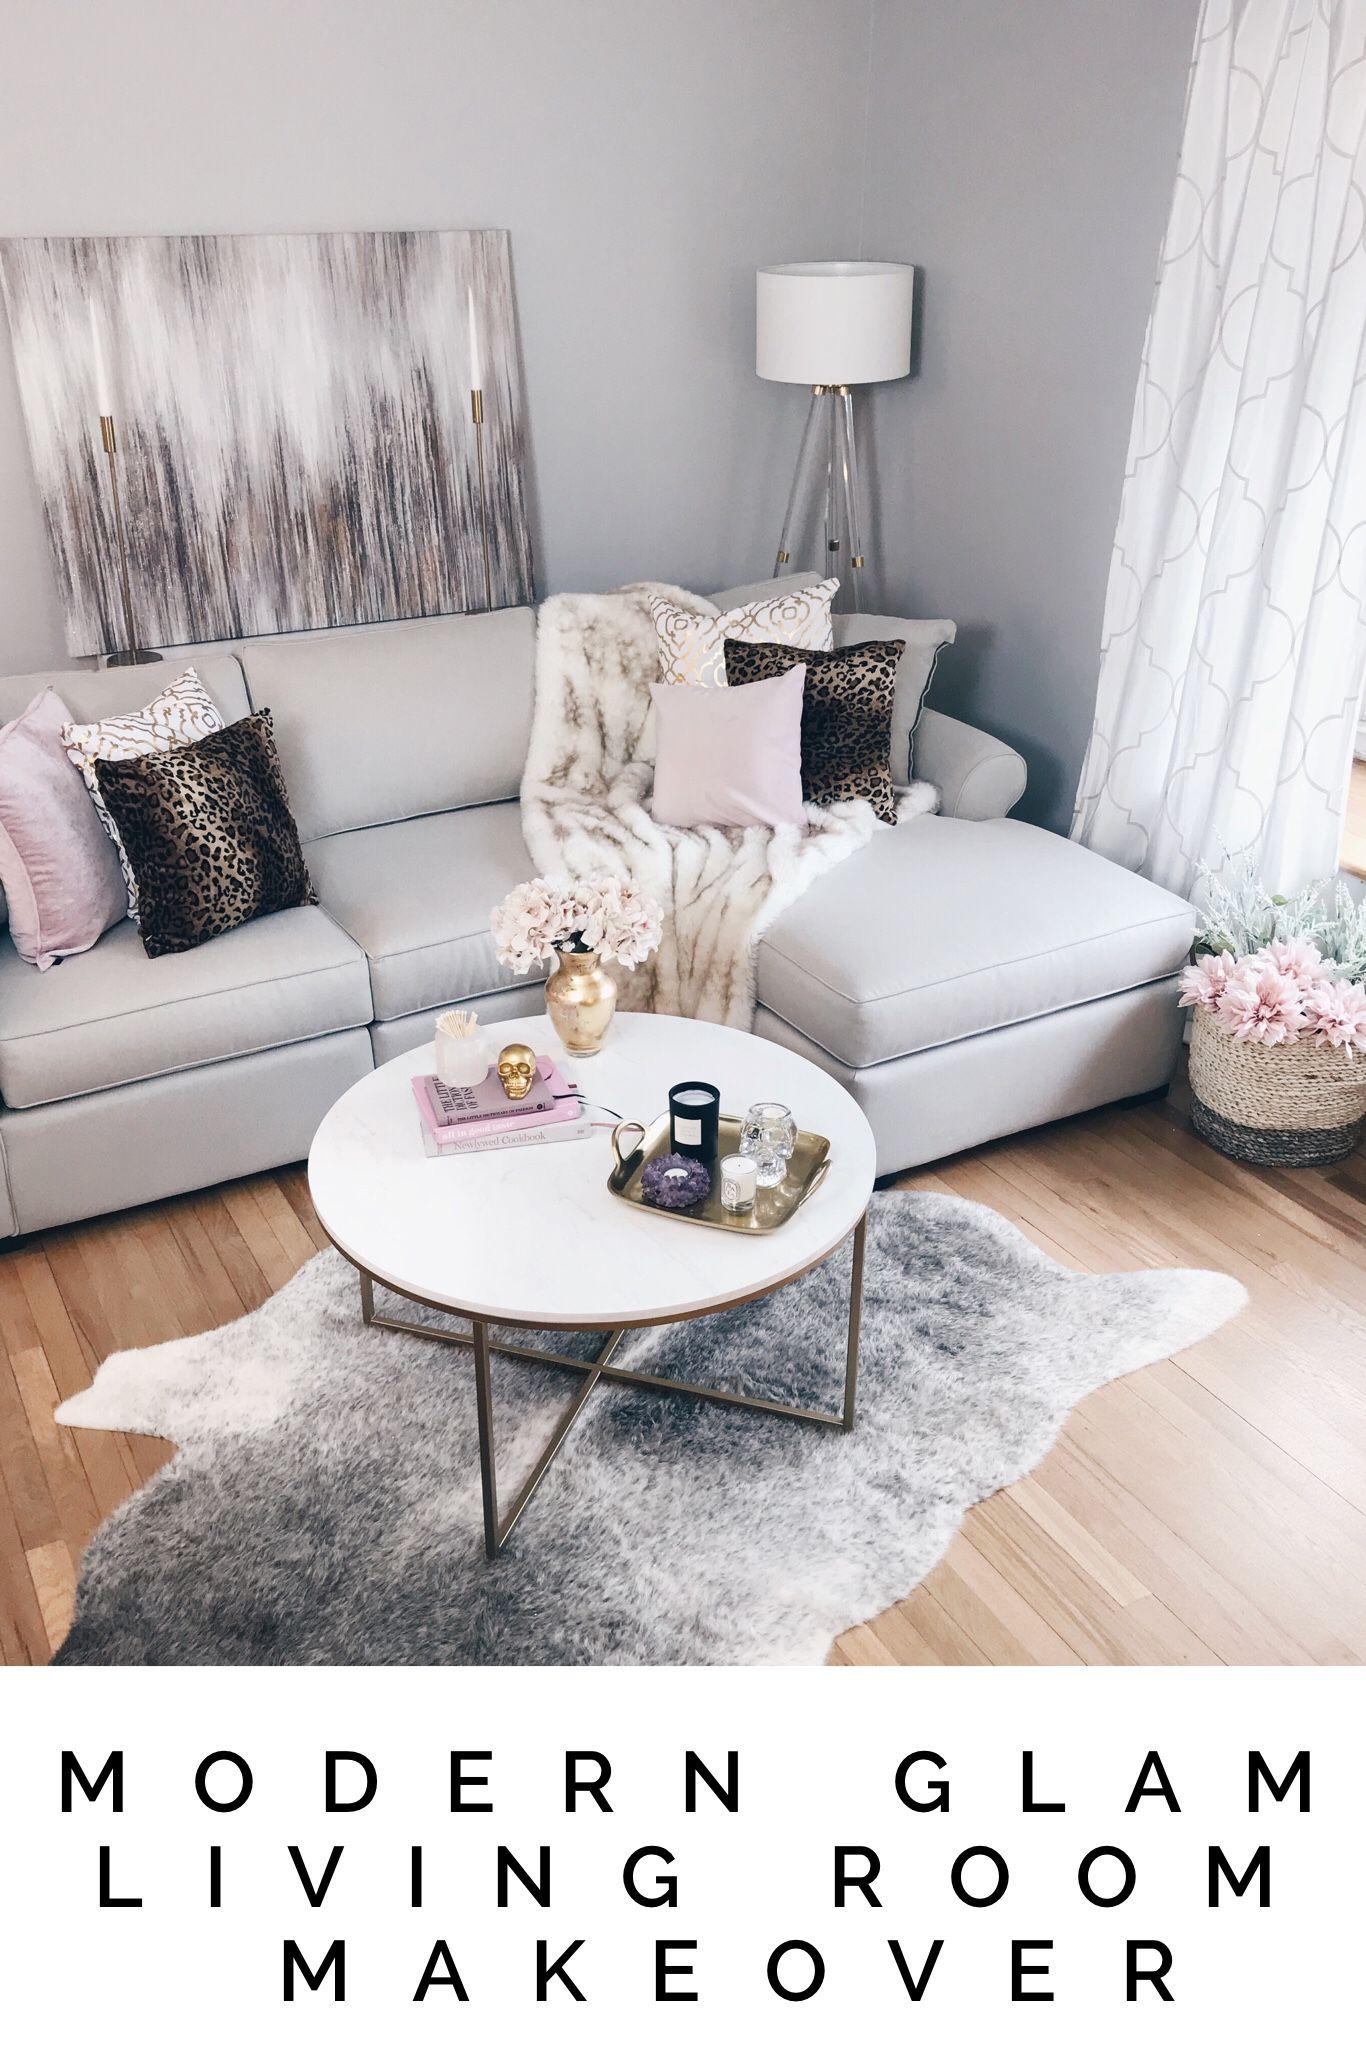 Living Room Modern Decoration: Bringing A Modern Glam Living Room Vision To Life